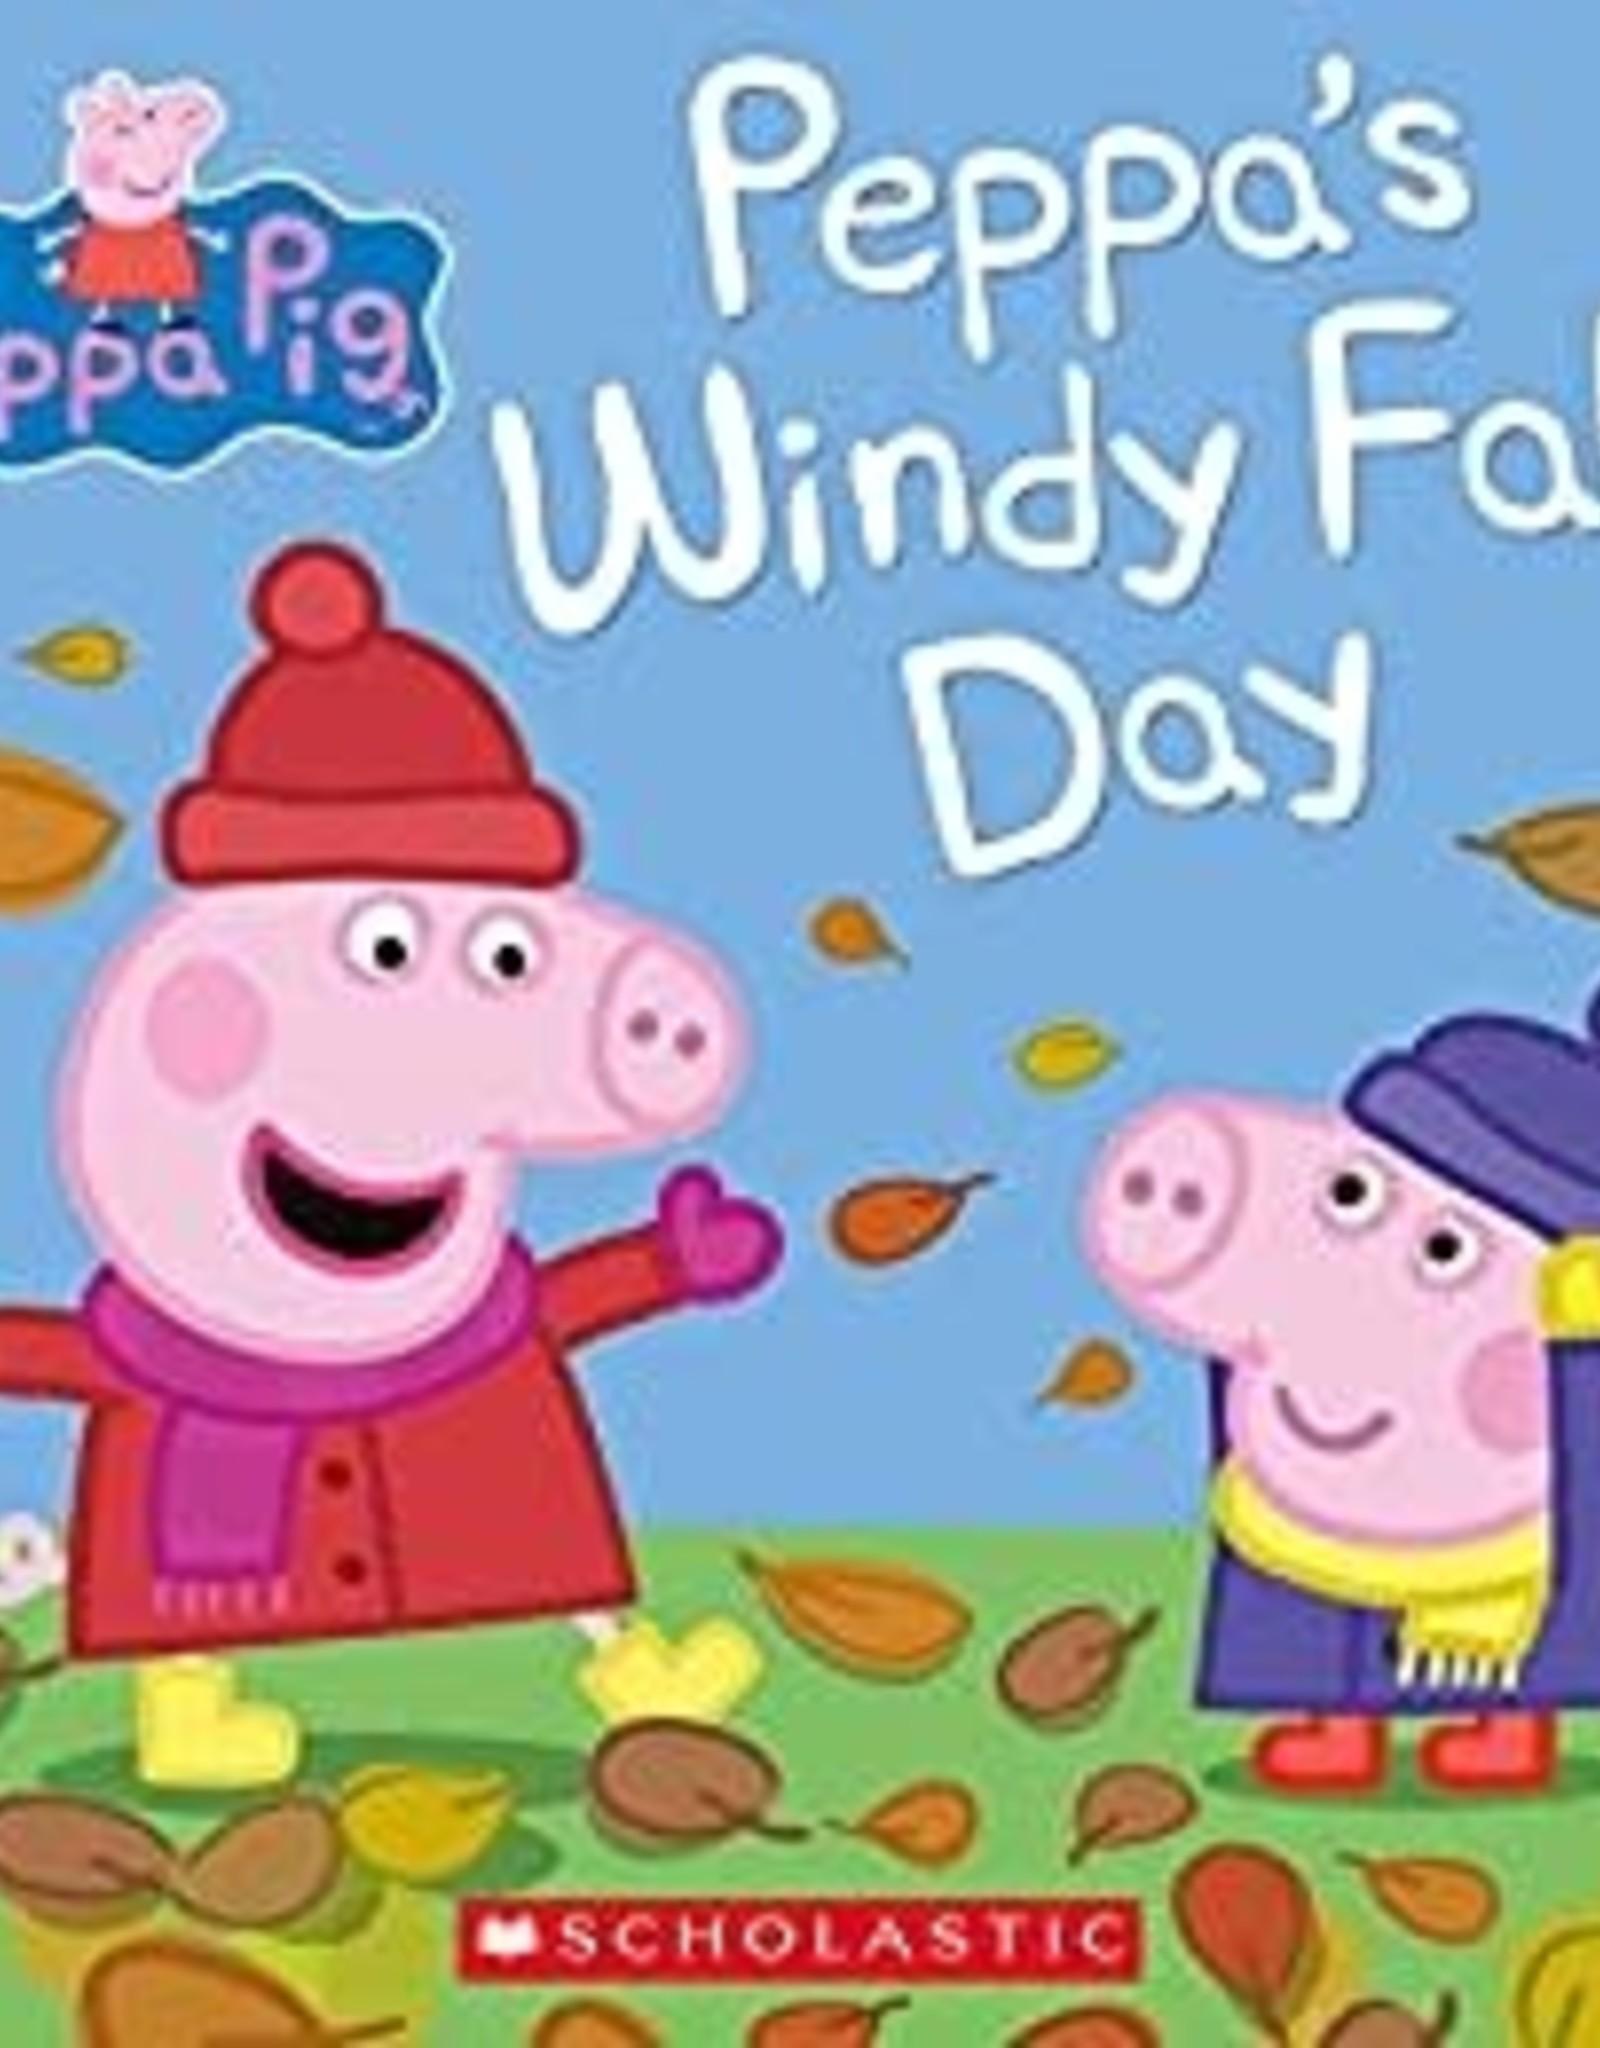 Scholastic Peppa Pig Peppa's Windy Fall Day